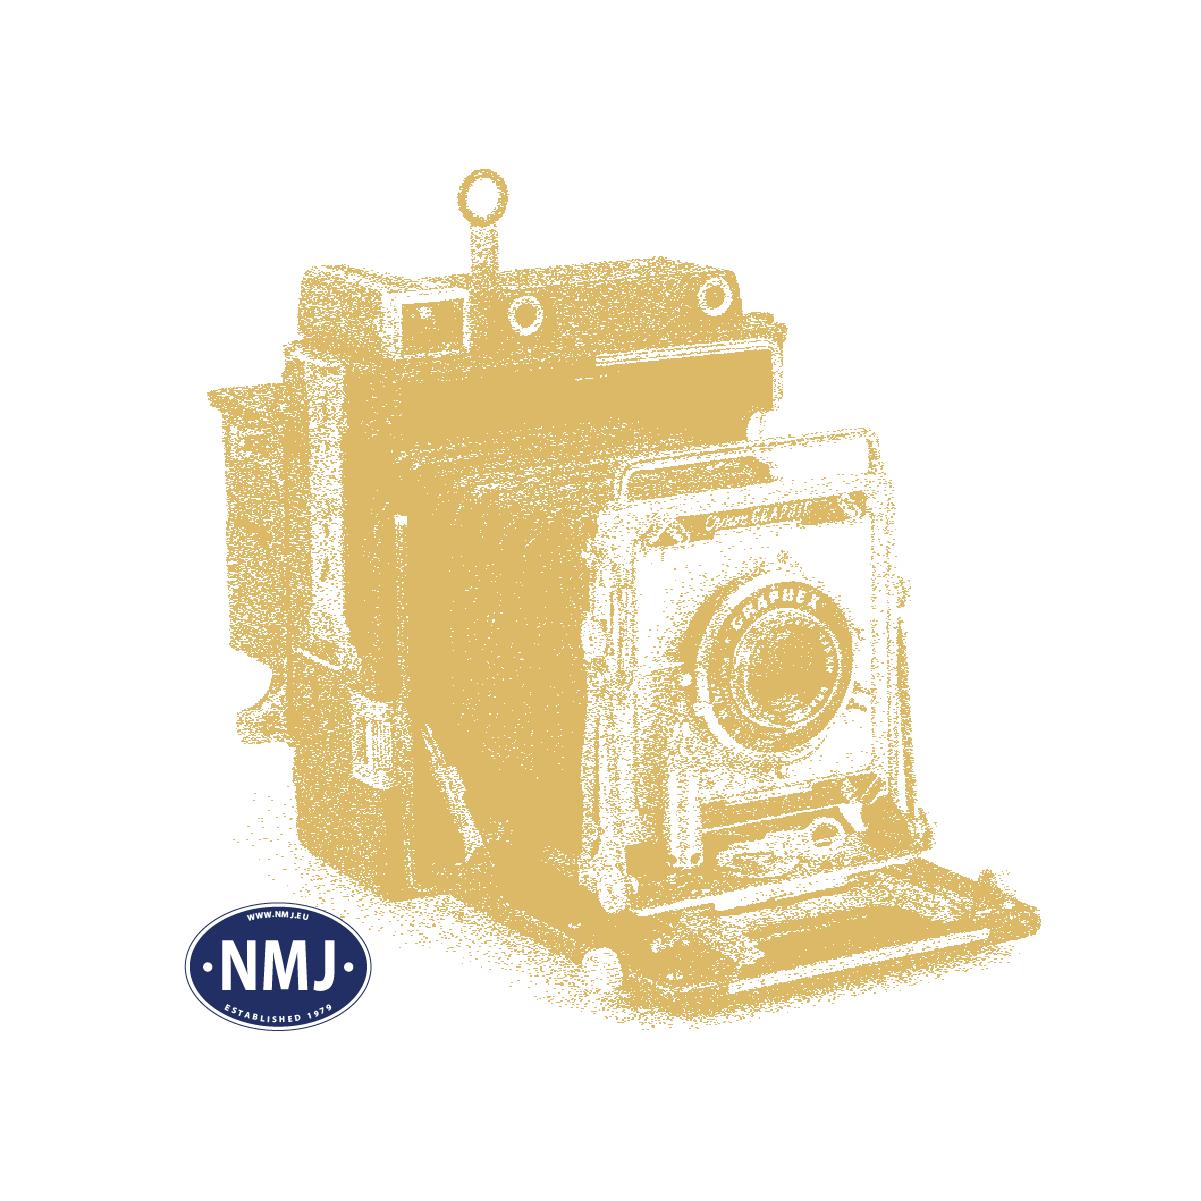 NMJT220.201 - NMJ Topline SJ Personvogn AB7b 3501